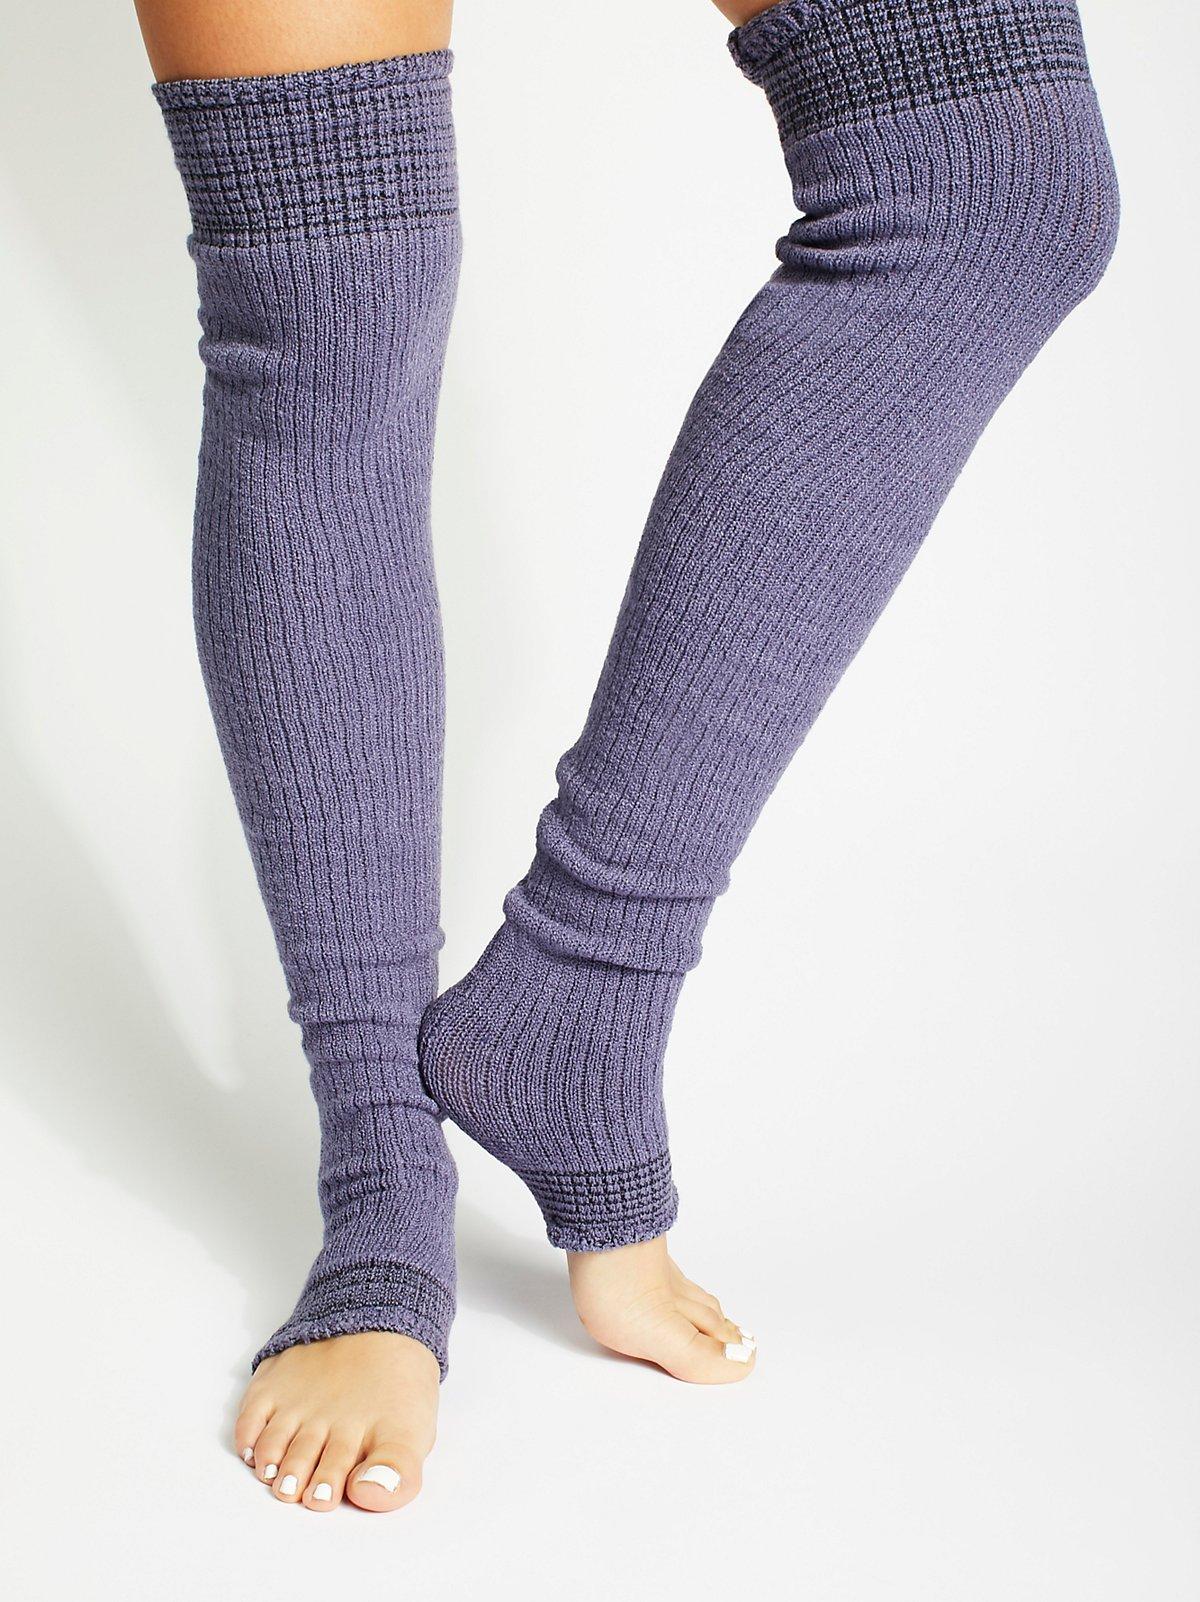 KD Dance暖腿袜